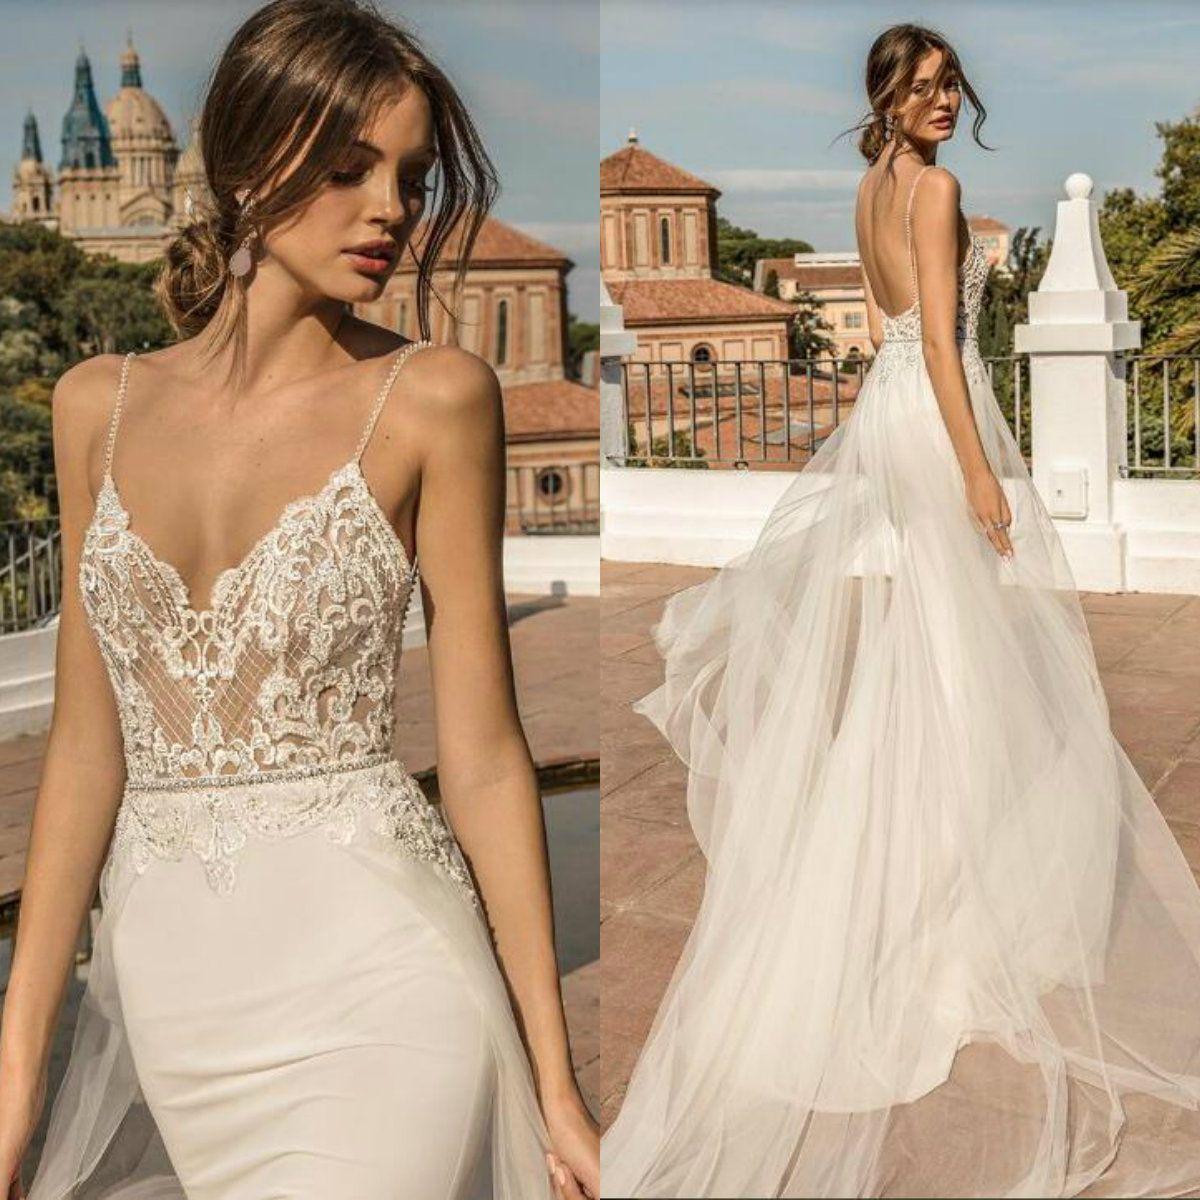 48206f6d24c Satin Wedding Dress Summer - Data Dynamic AG